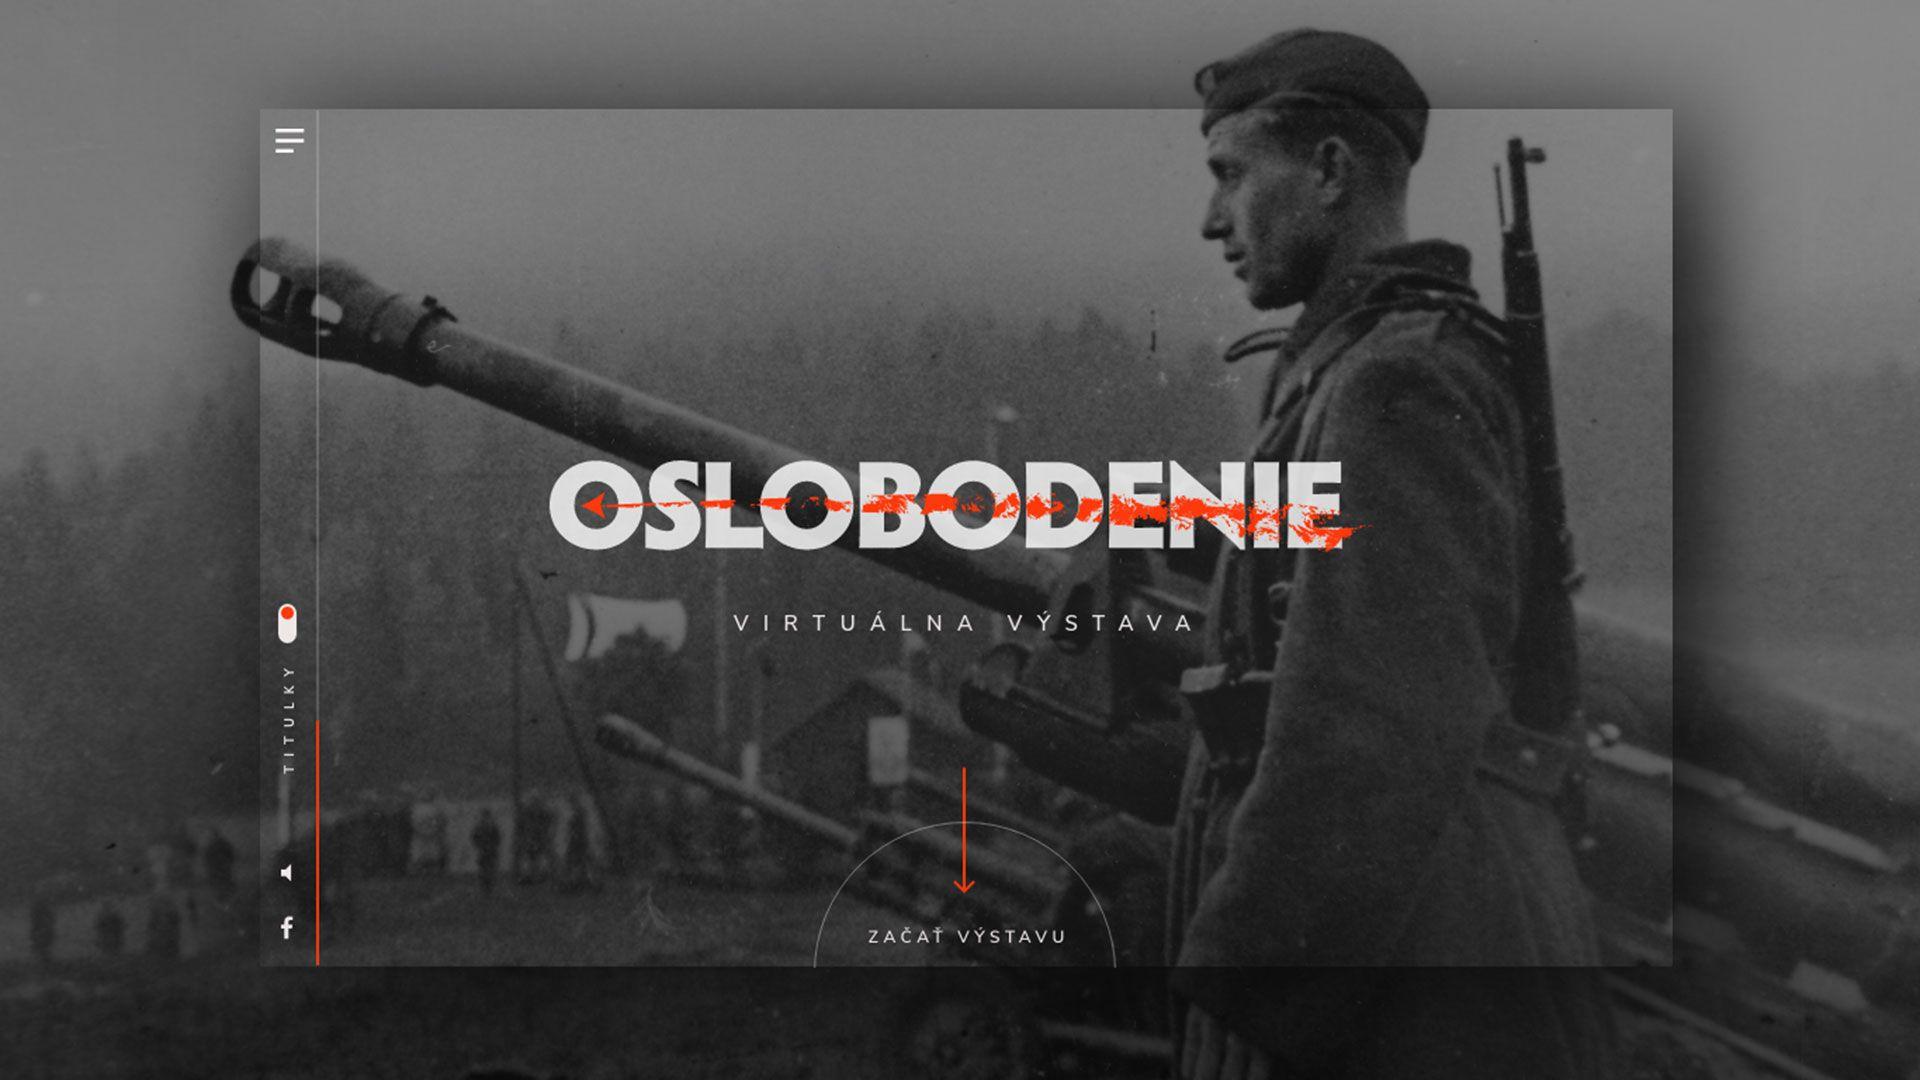 vojak stojaci vedľa dela oslobodenie Slovenska